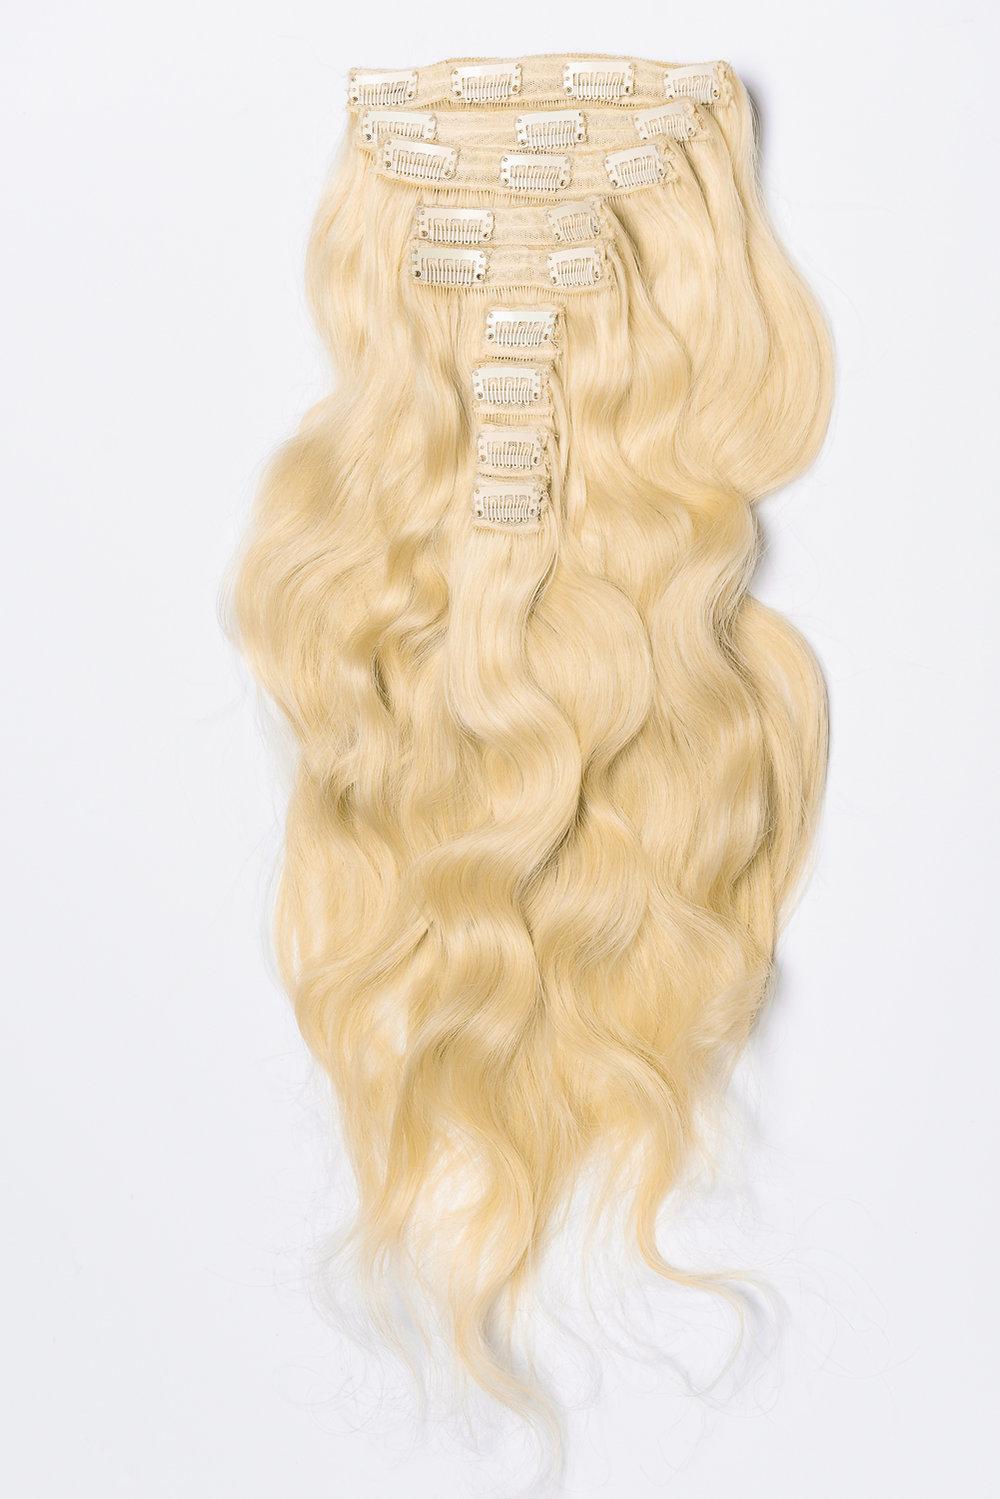 #60 Lightest Blonde